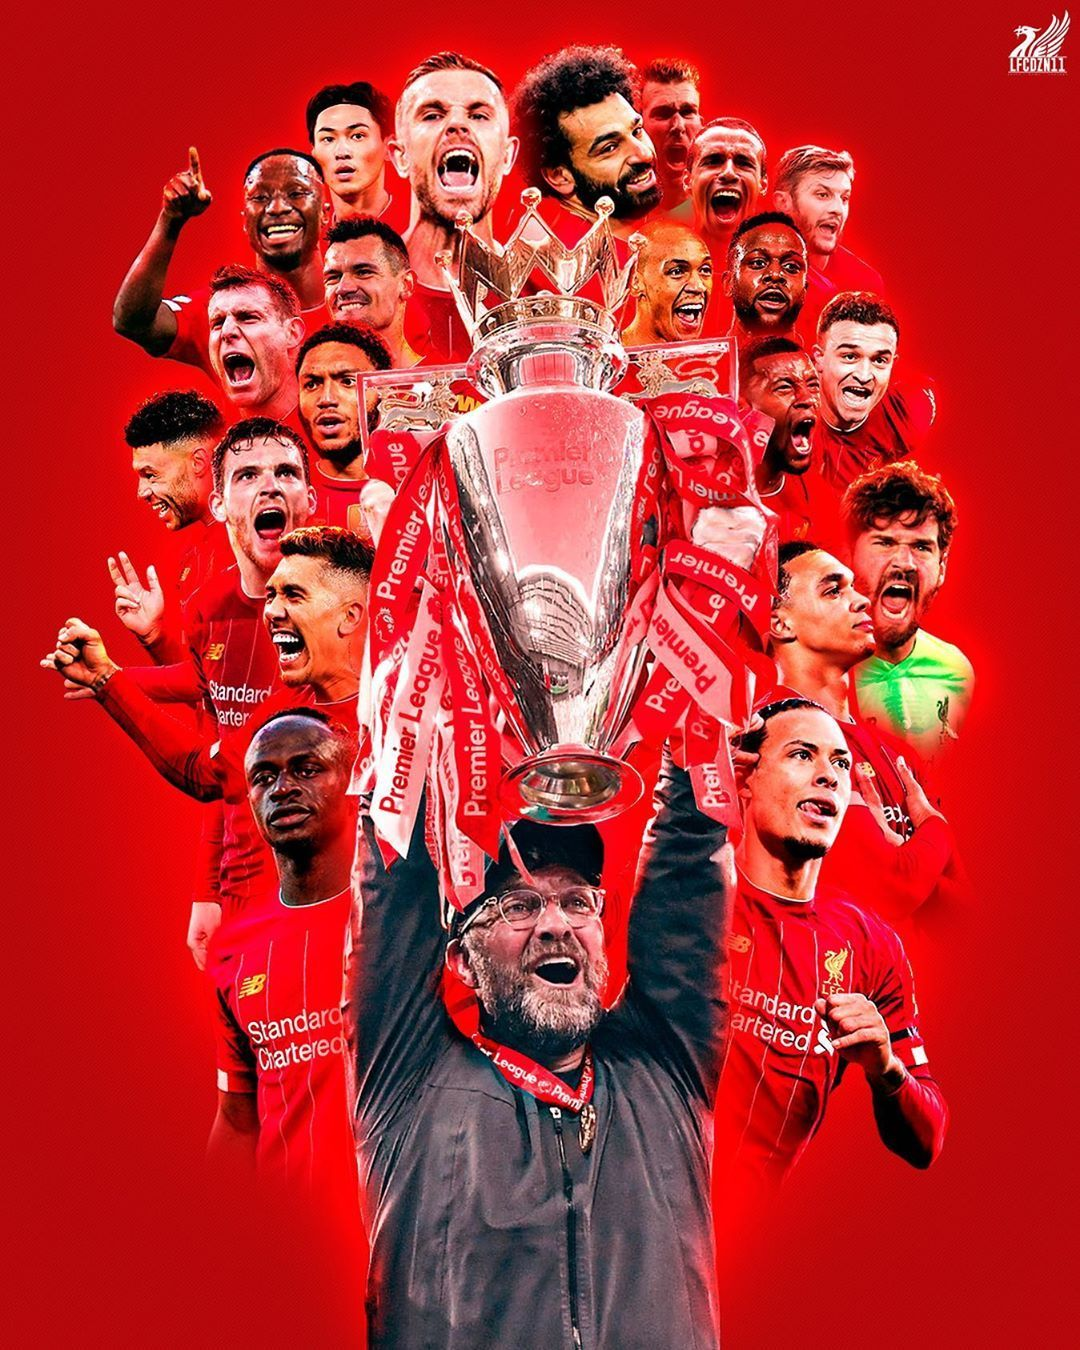 Pin on My Liverpool FC Artwork